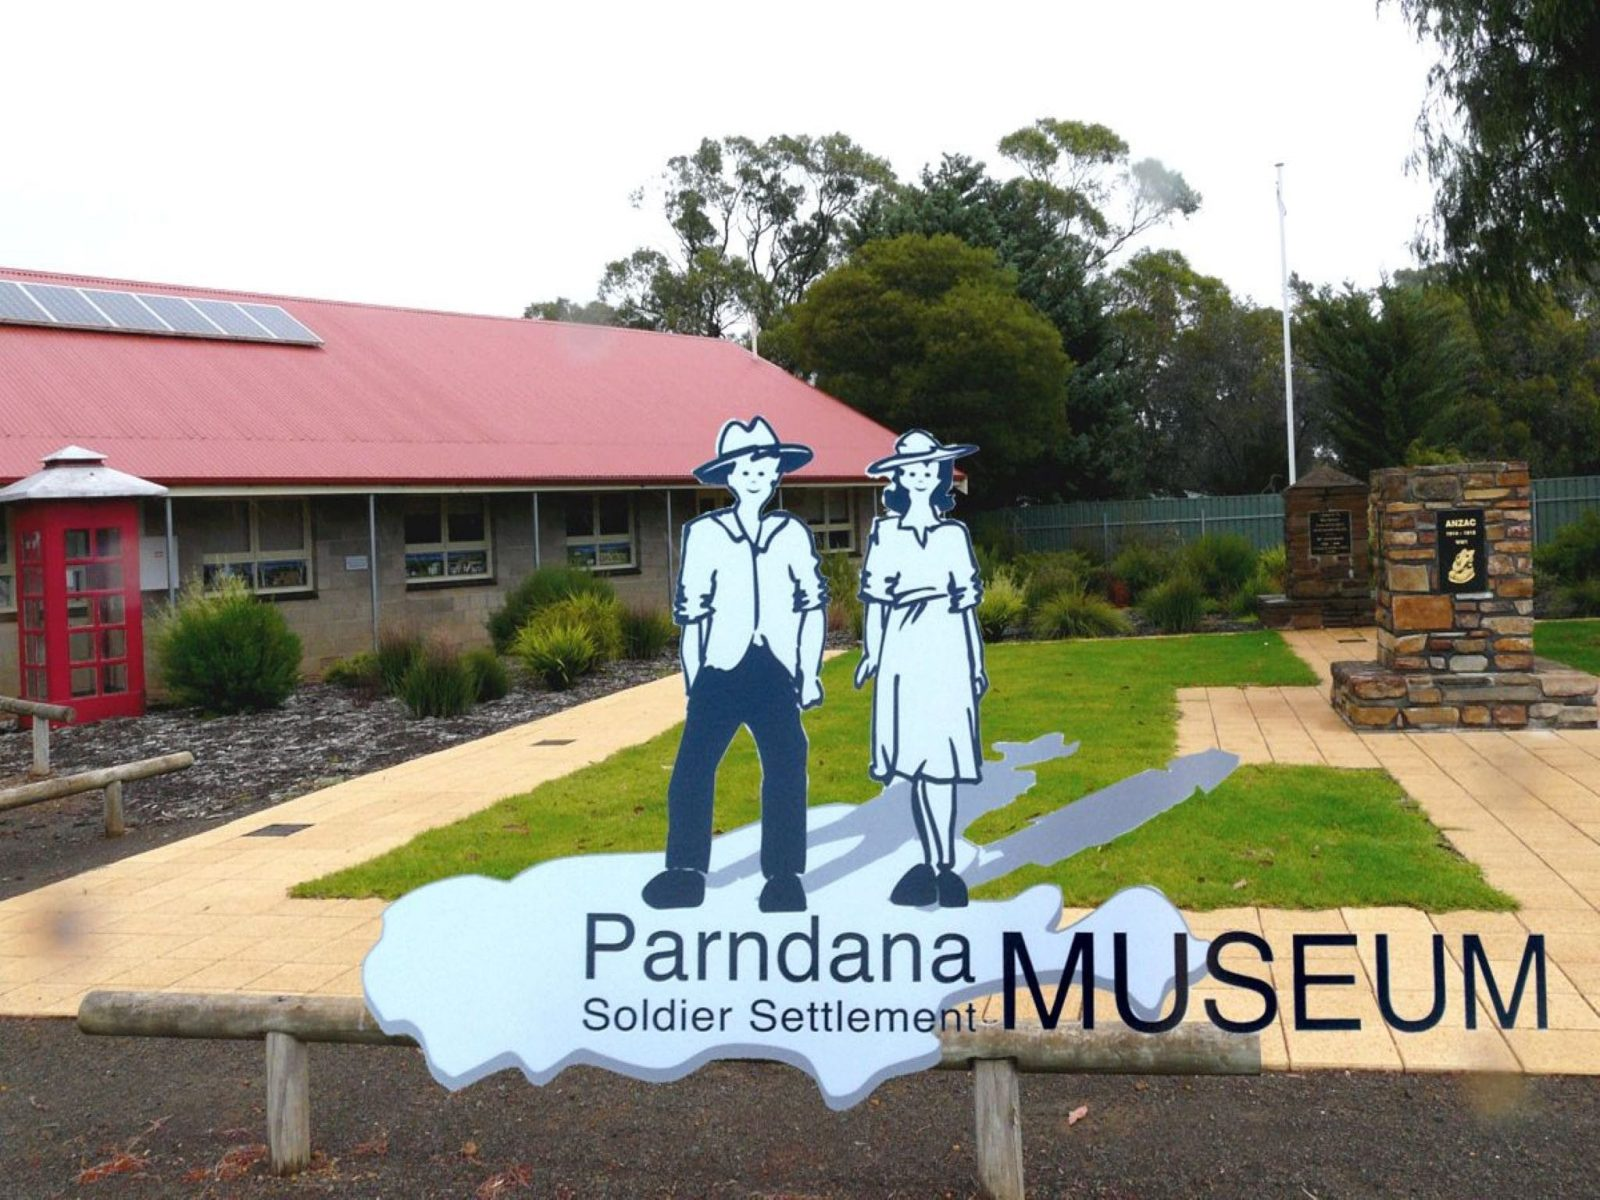 Parndana Soldier Settlement Museum